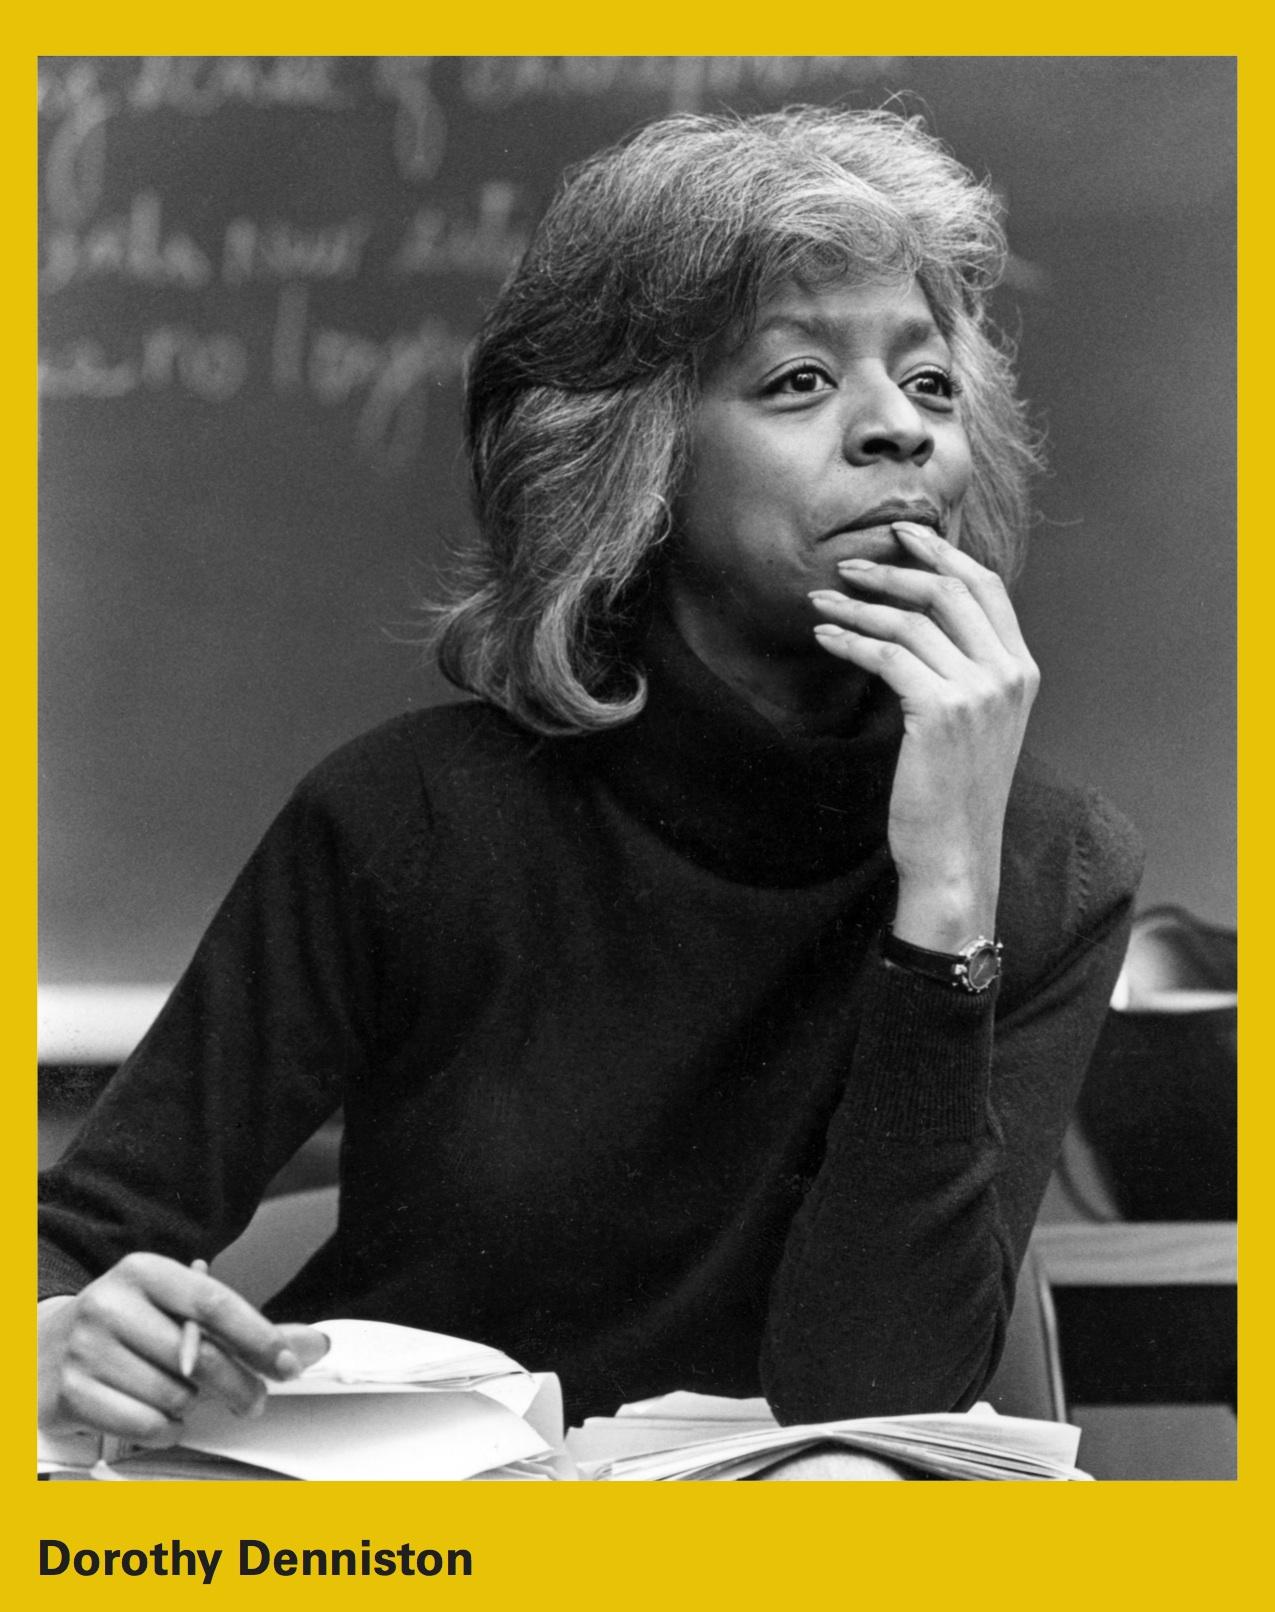 Photo by John Foraste. Brown University Archives